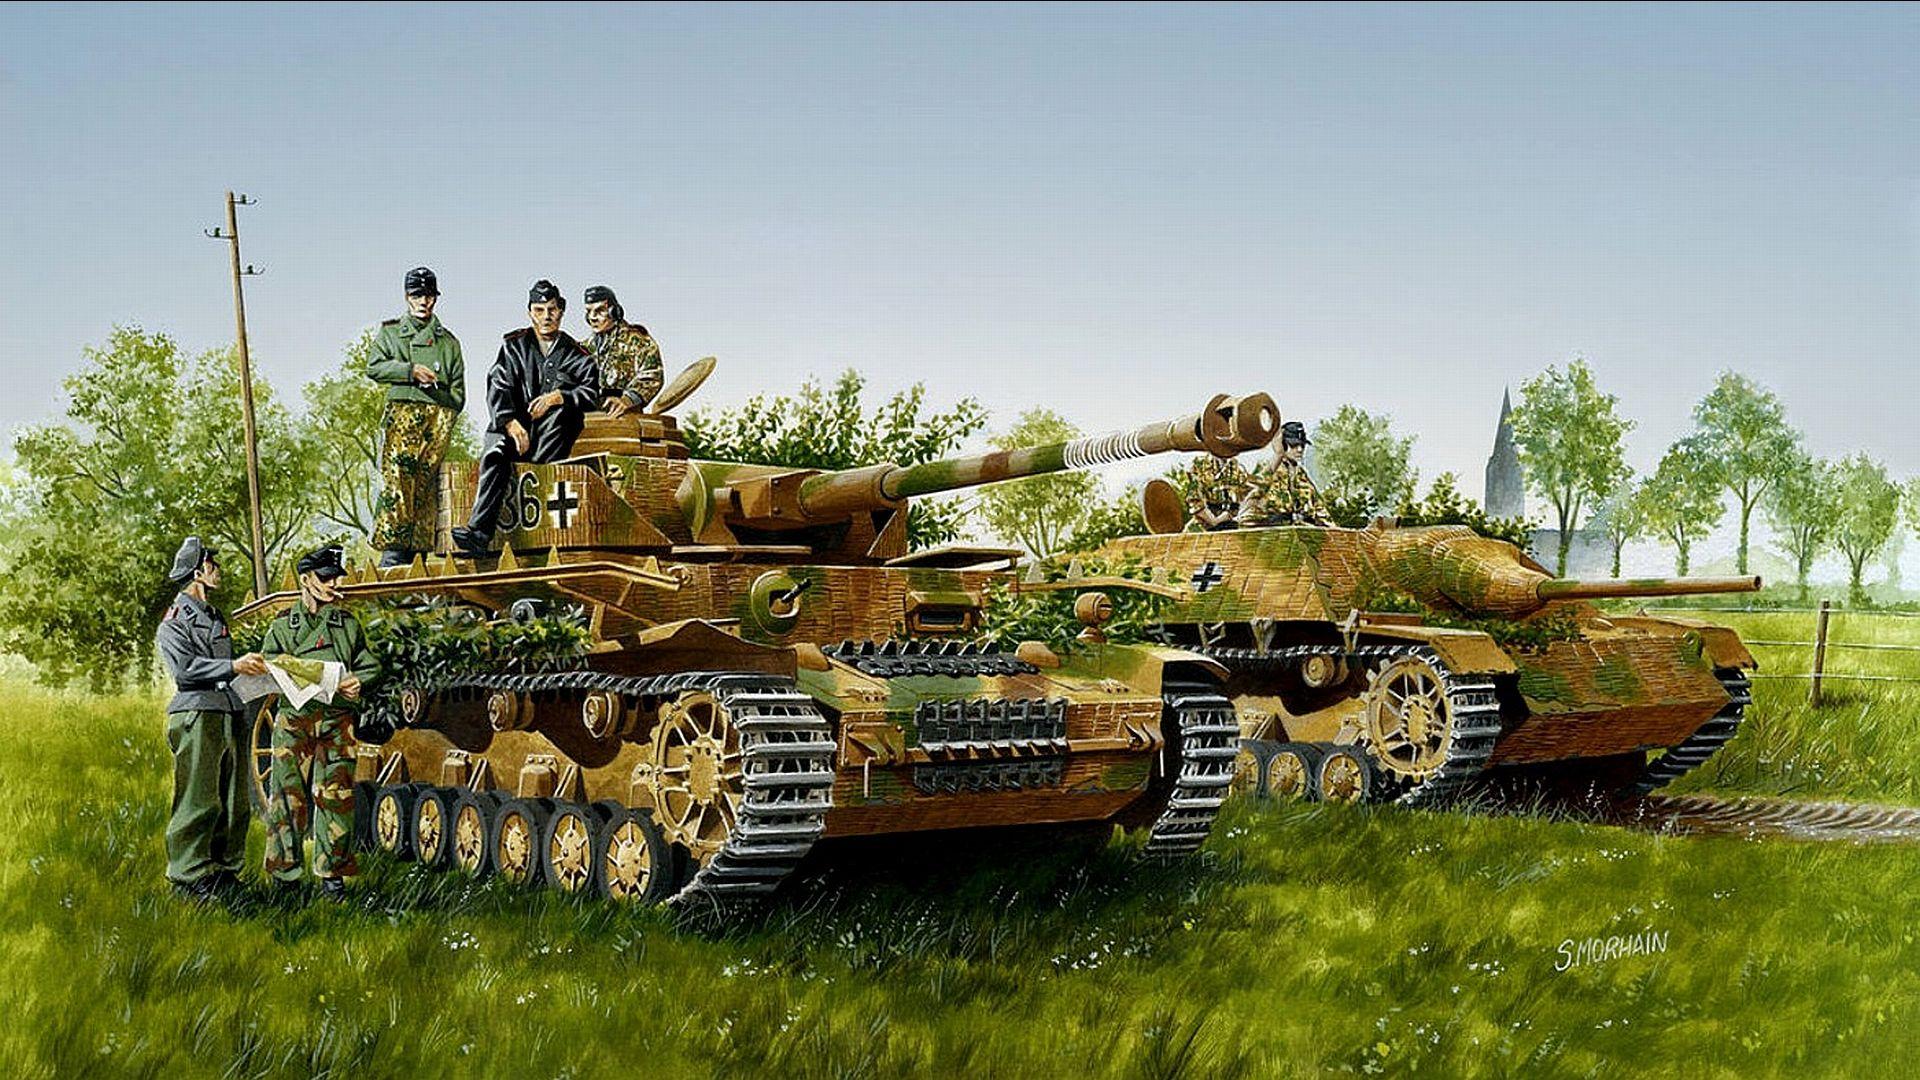 ww2 german army wallpaper - photo #15